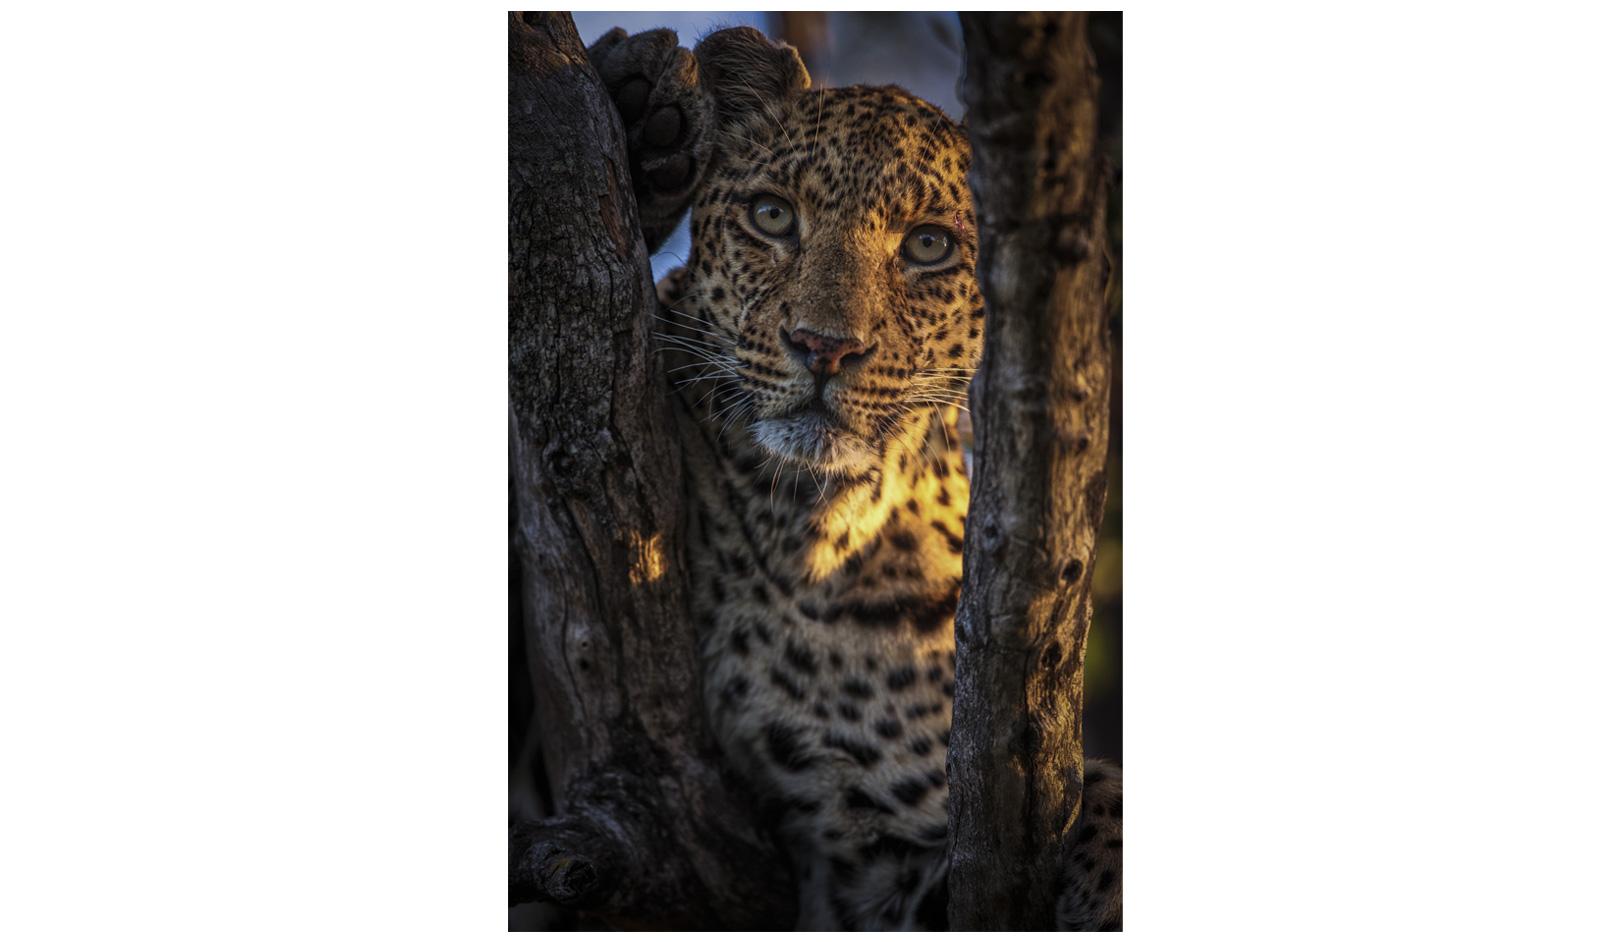 safari magazine gujarati pdf free download 2015